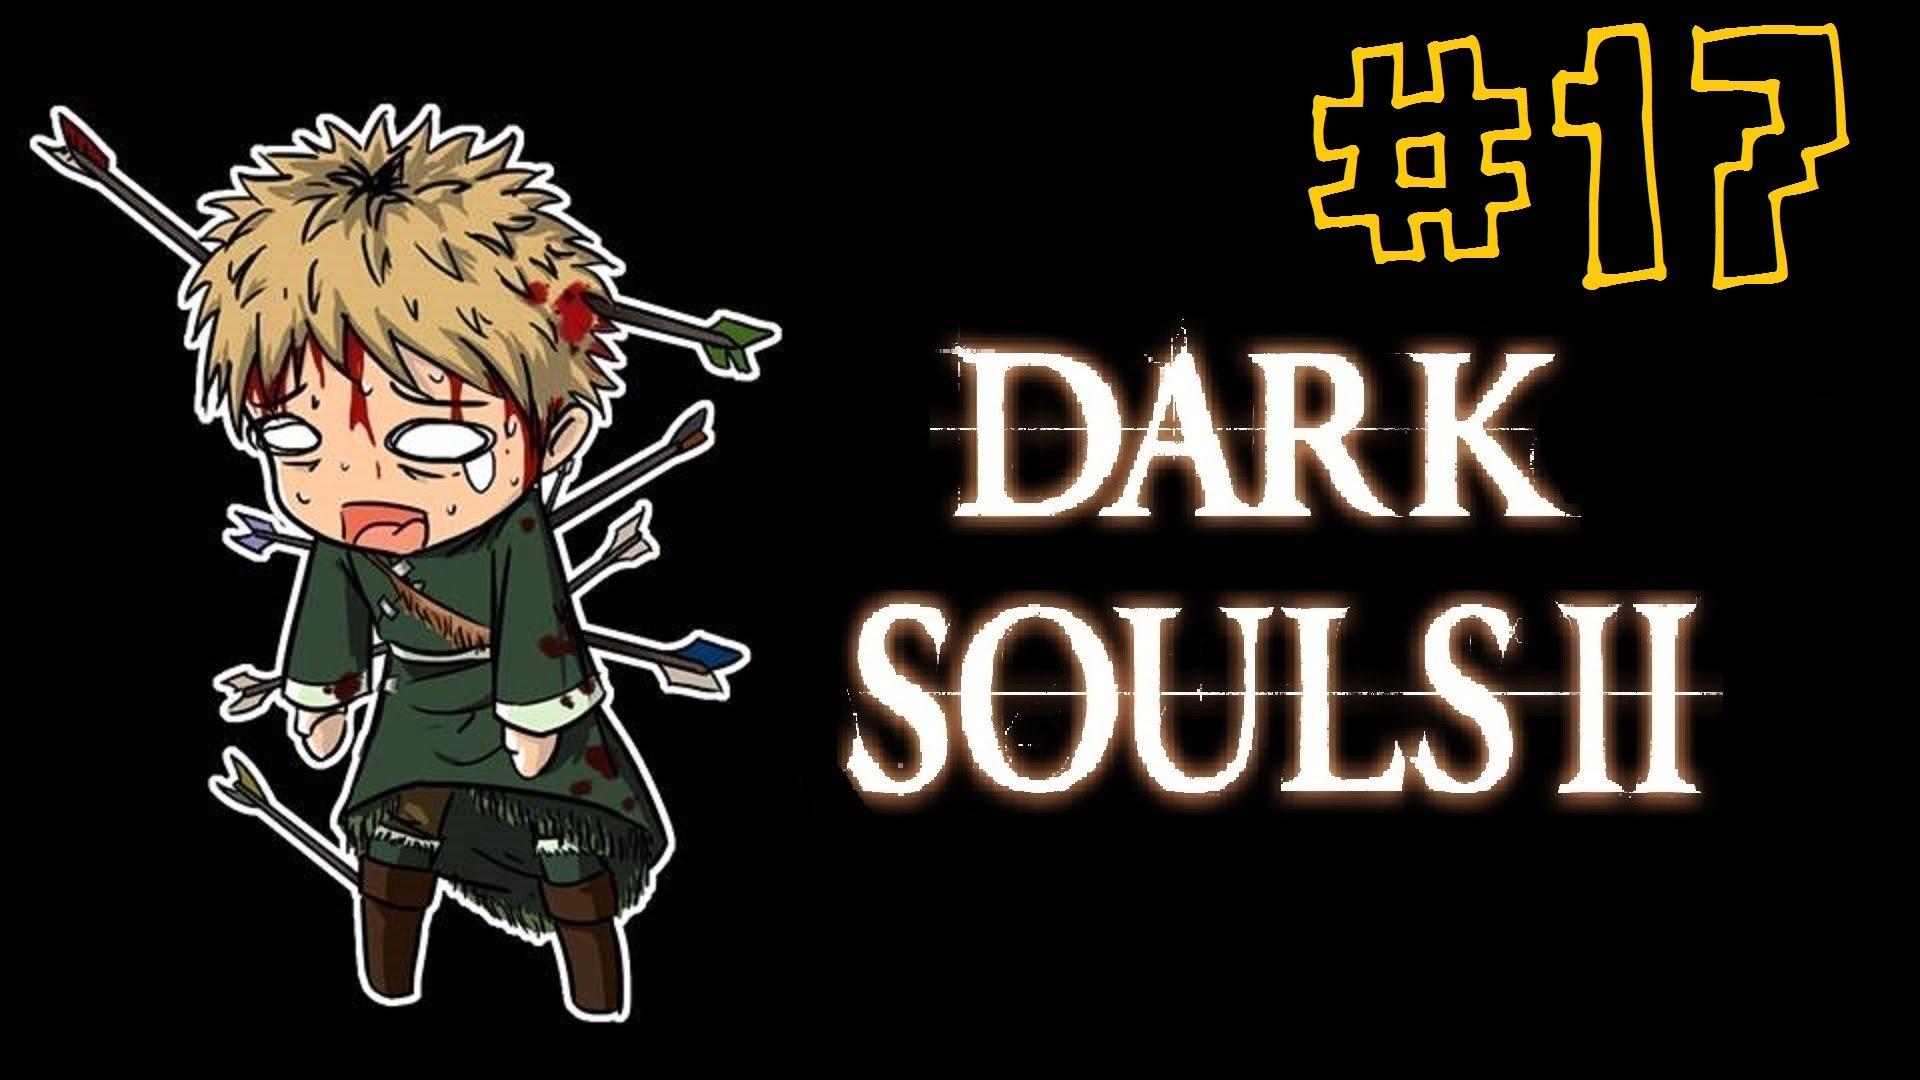 Dark Souls clipart drake #3